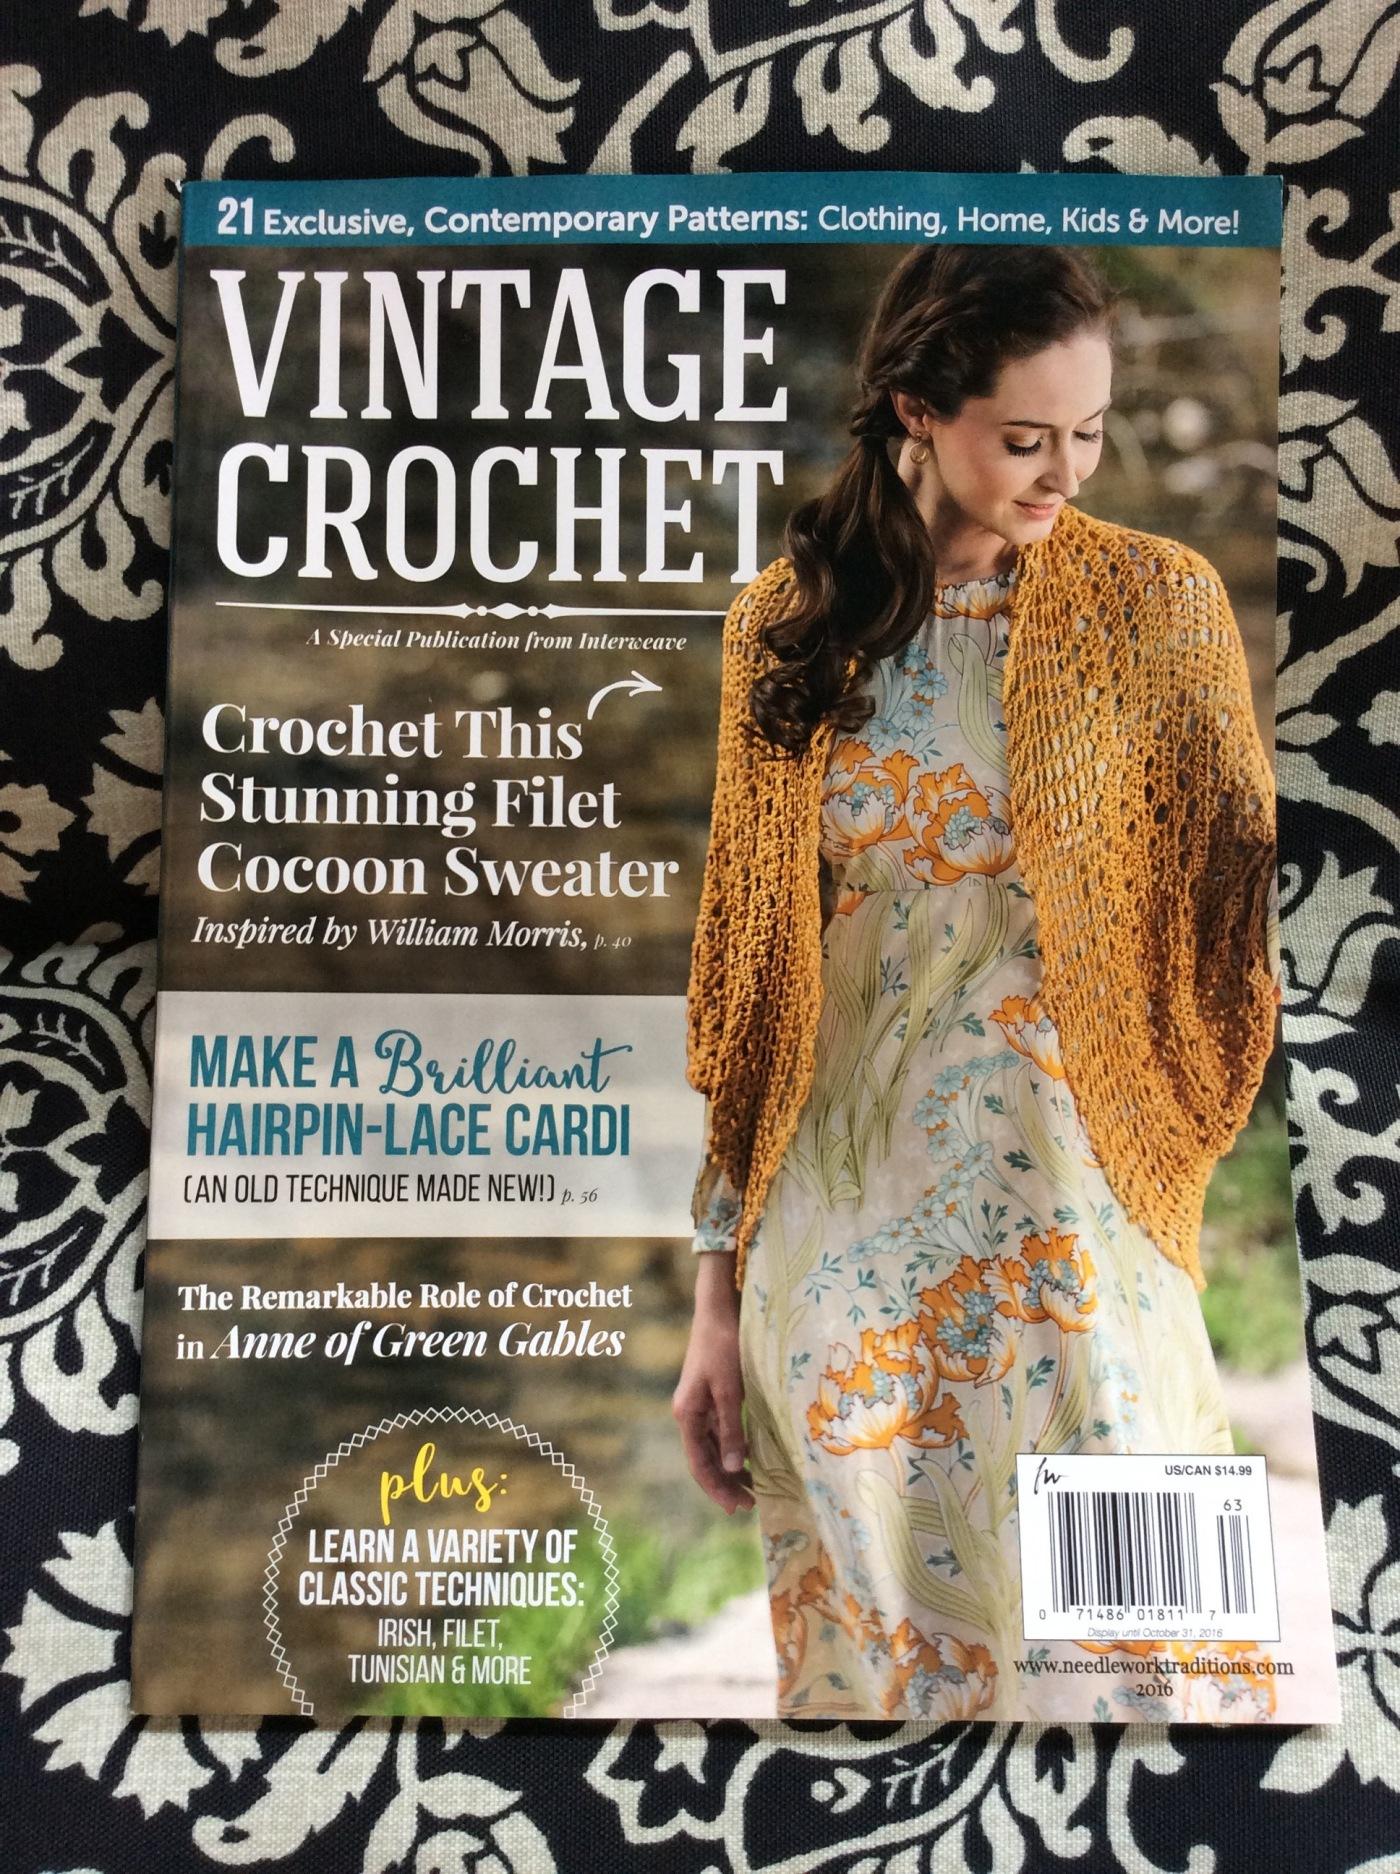 Vintage Crochet 2016